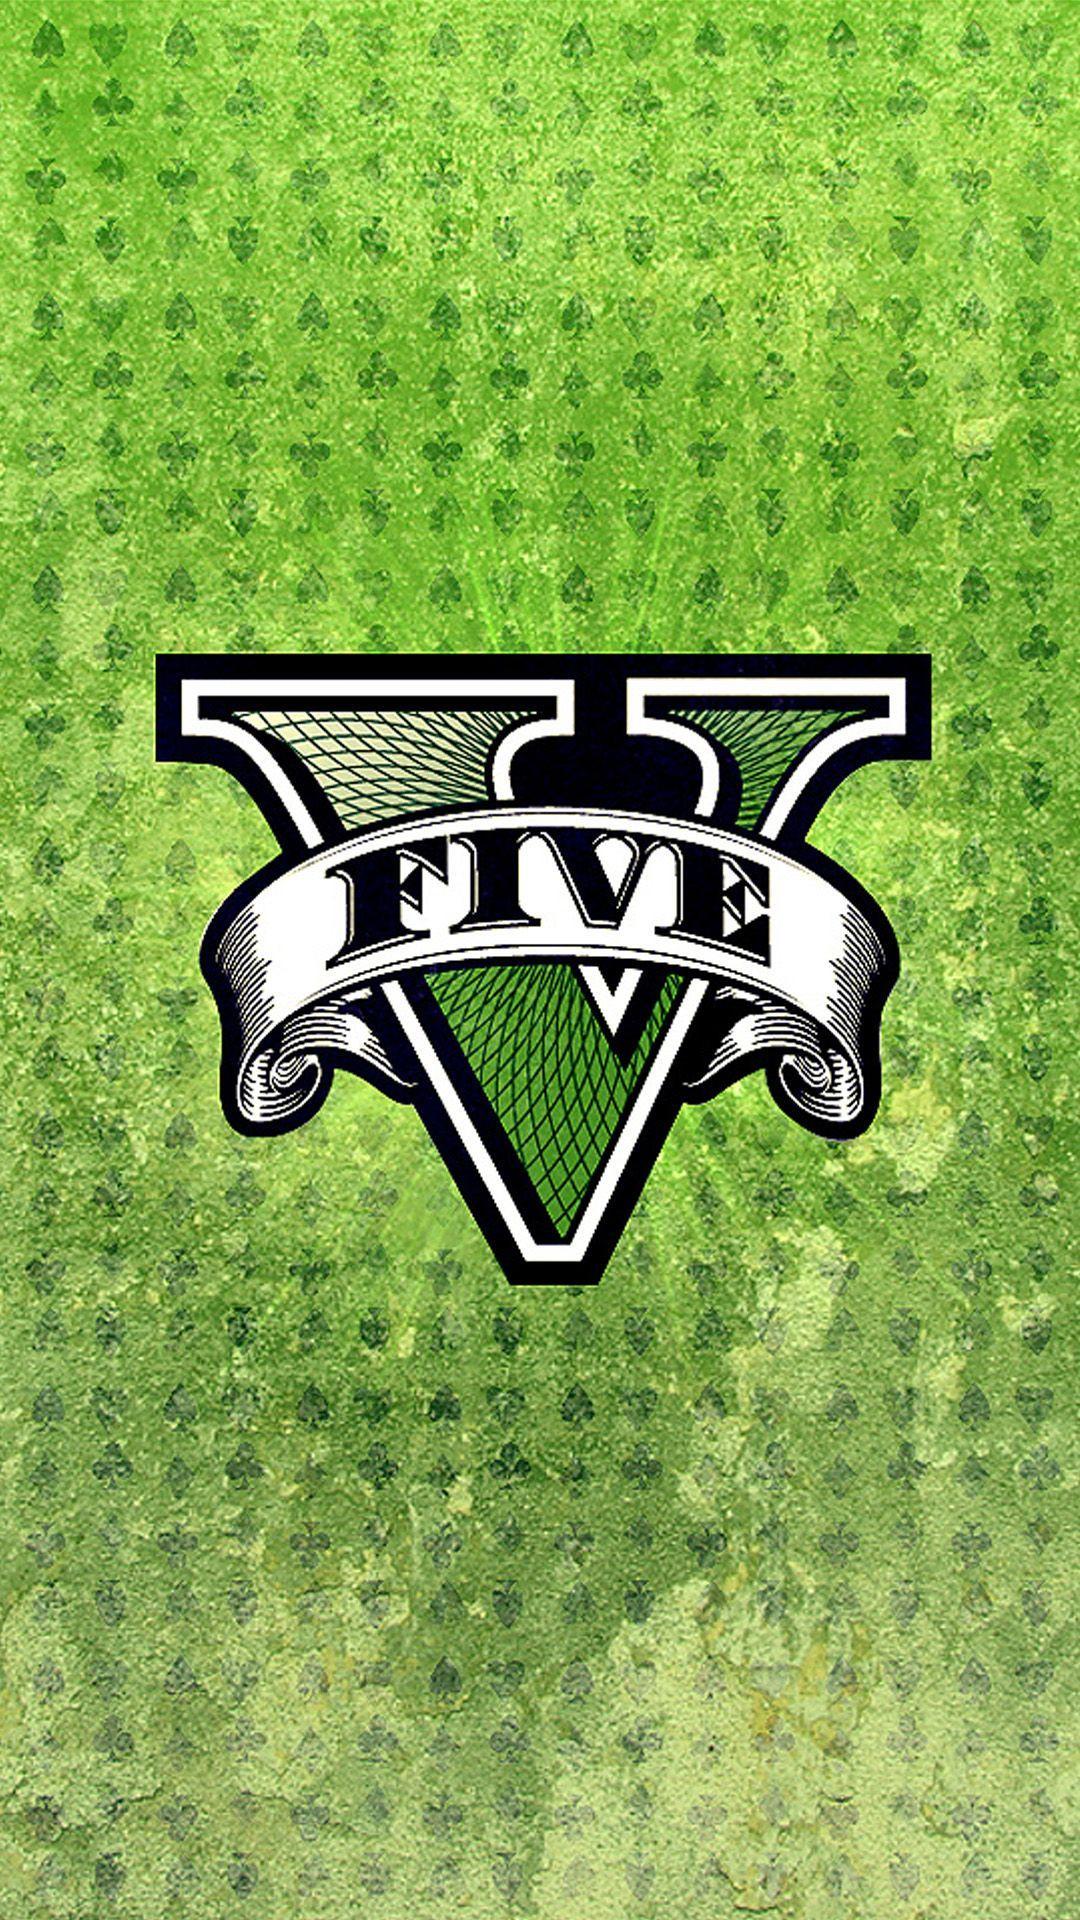 GTA 5 Logo Wallpapers - Wallpaper Cave